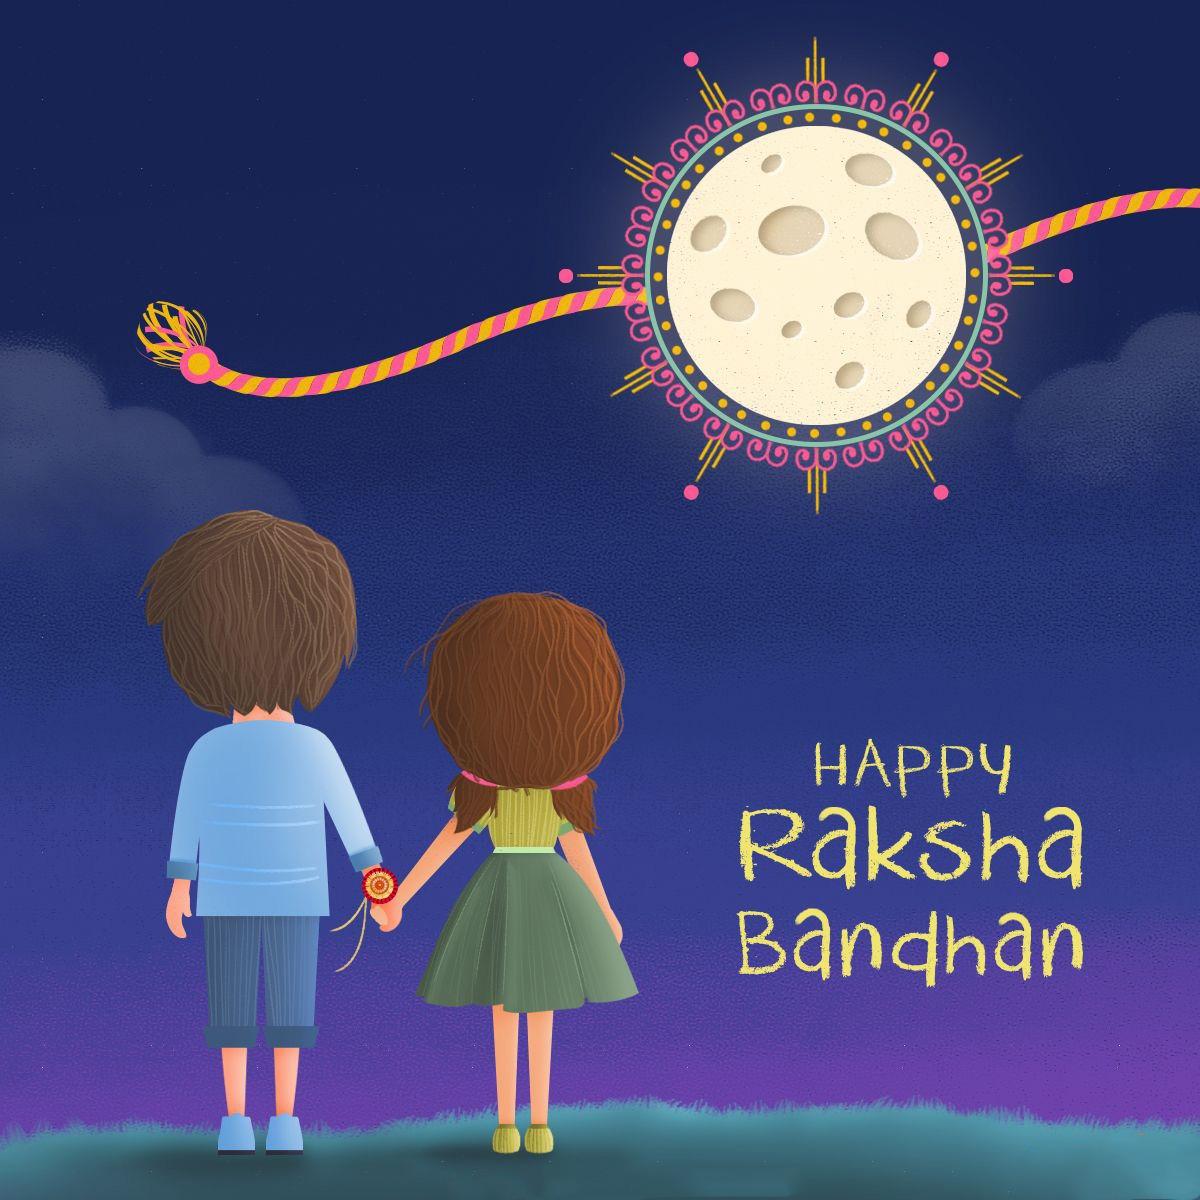 Raksha Bandhan brother and sister photo